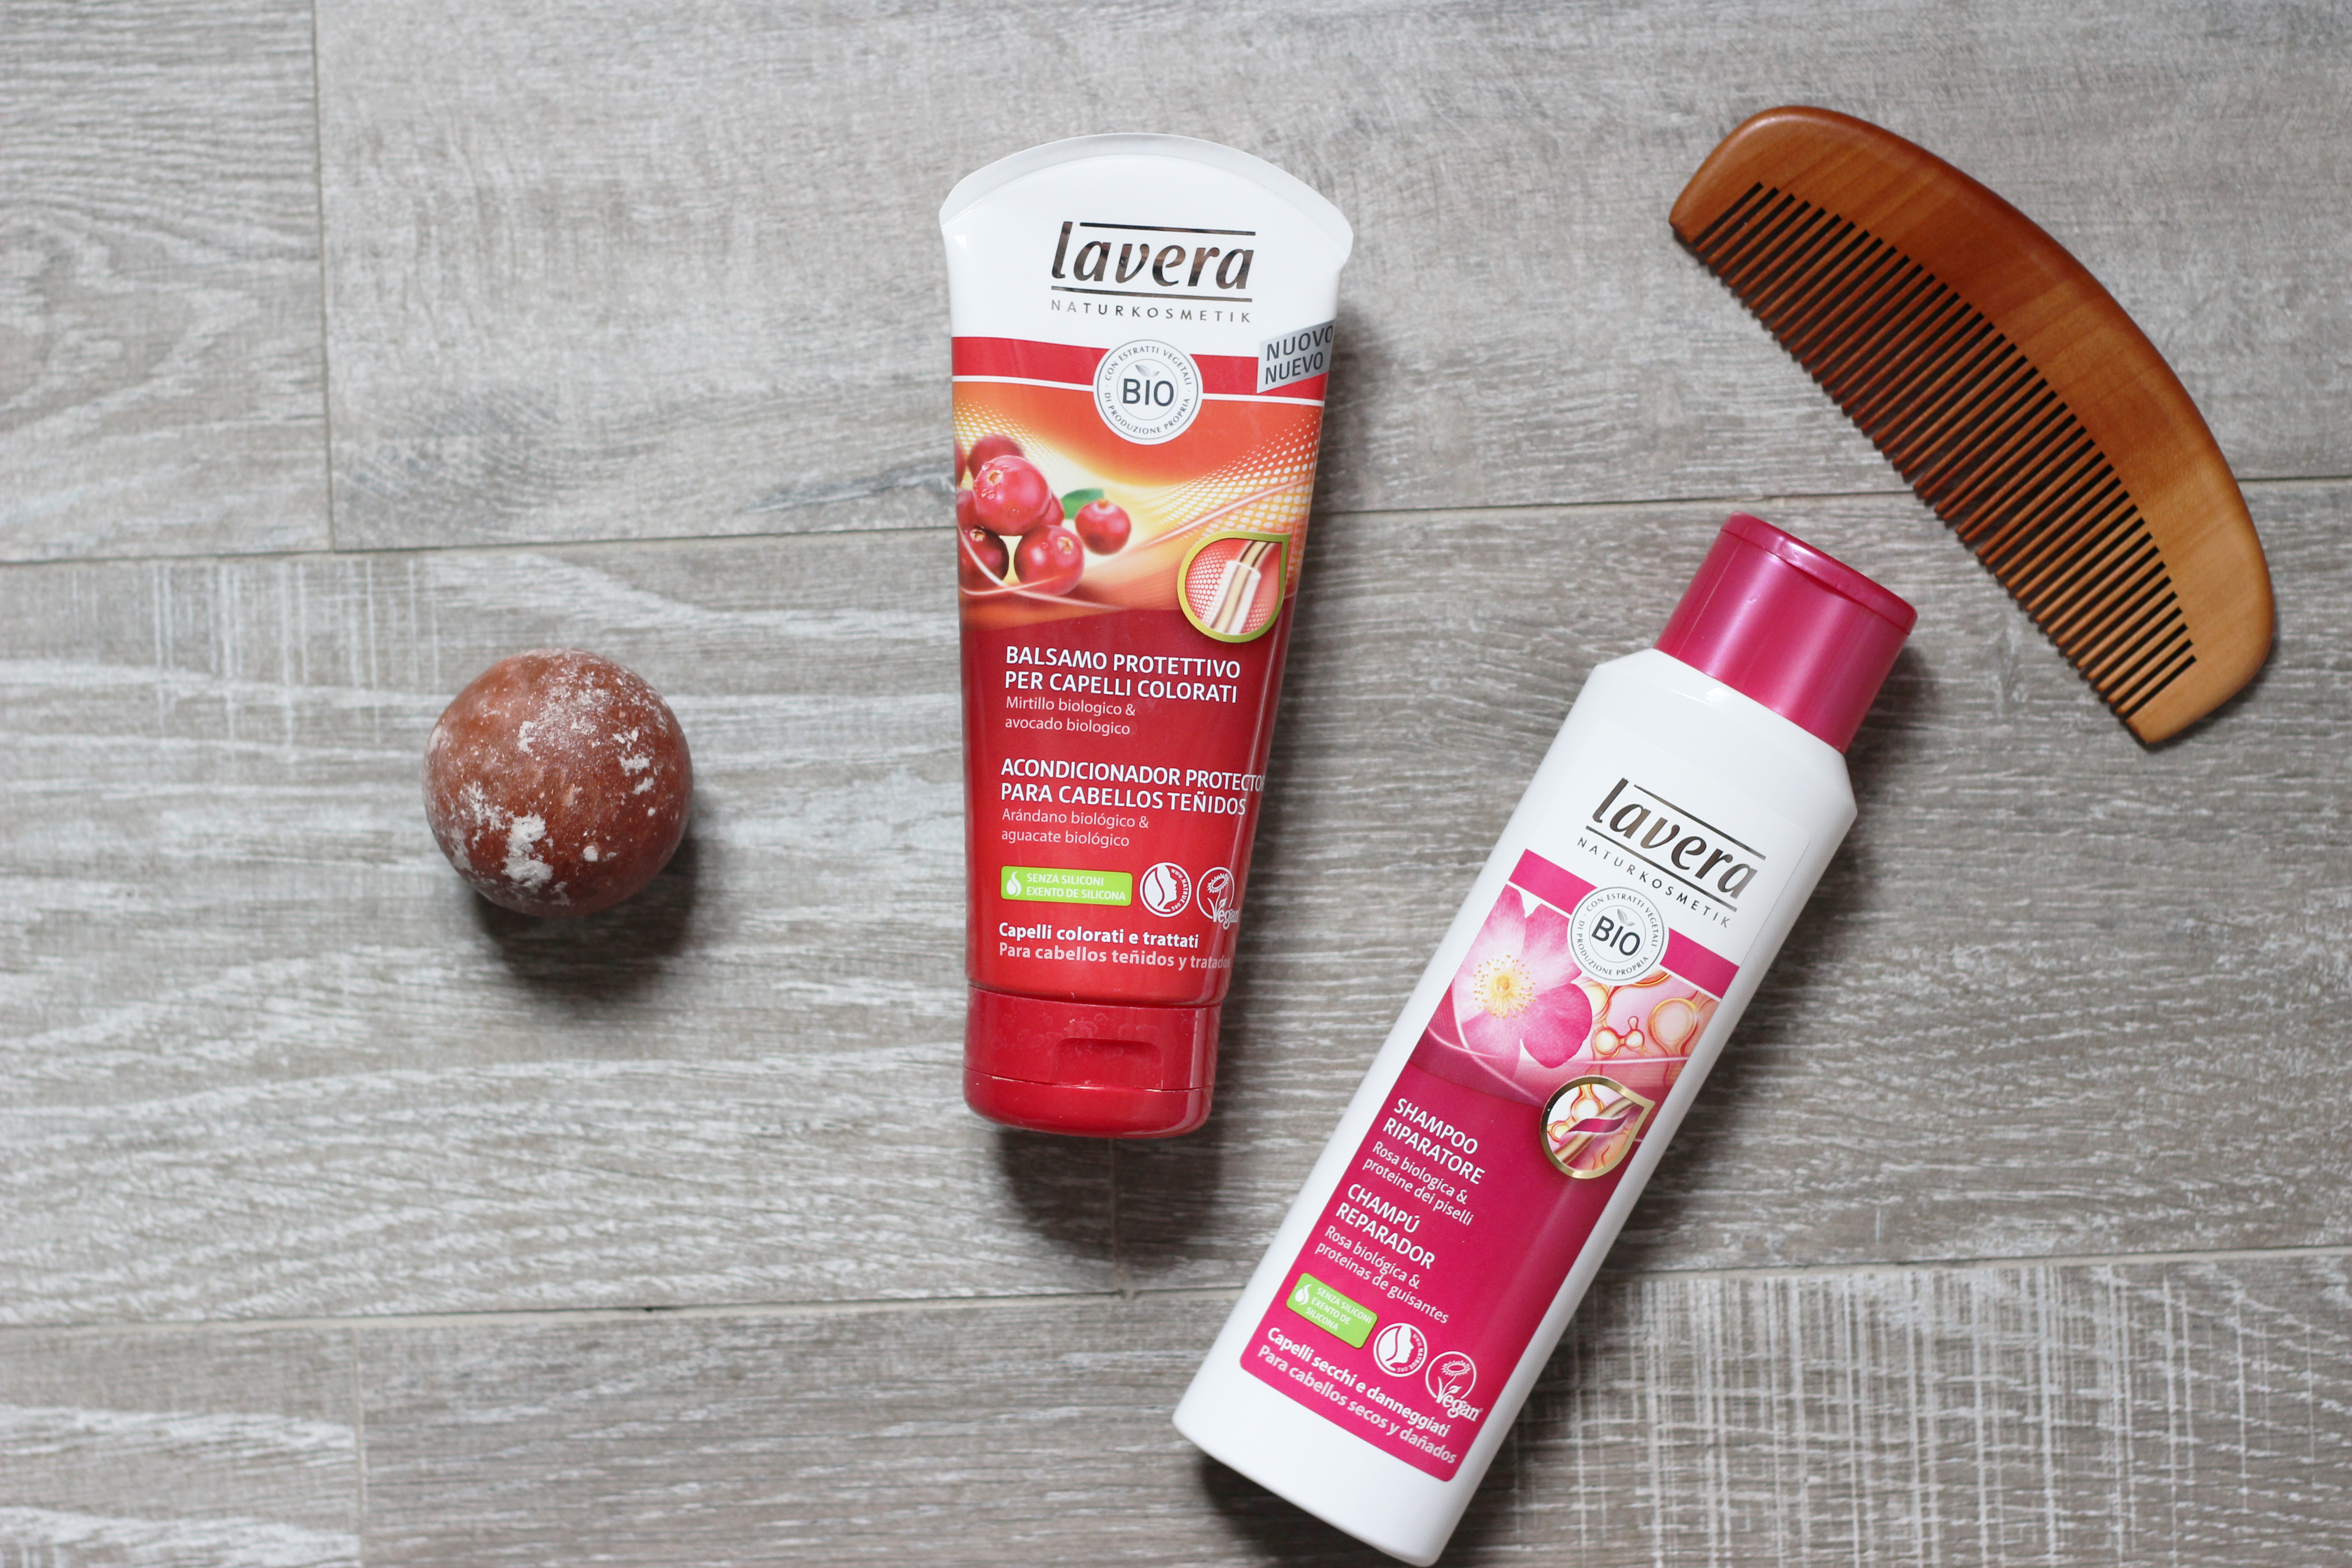 shampoo e balsamo lavera vegan